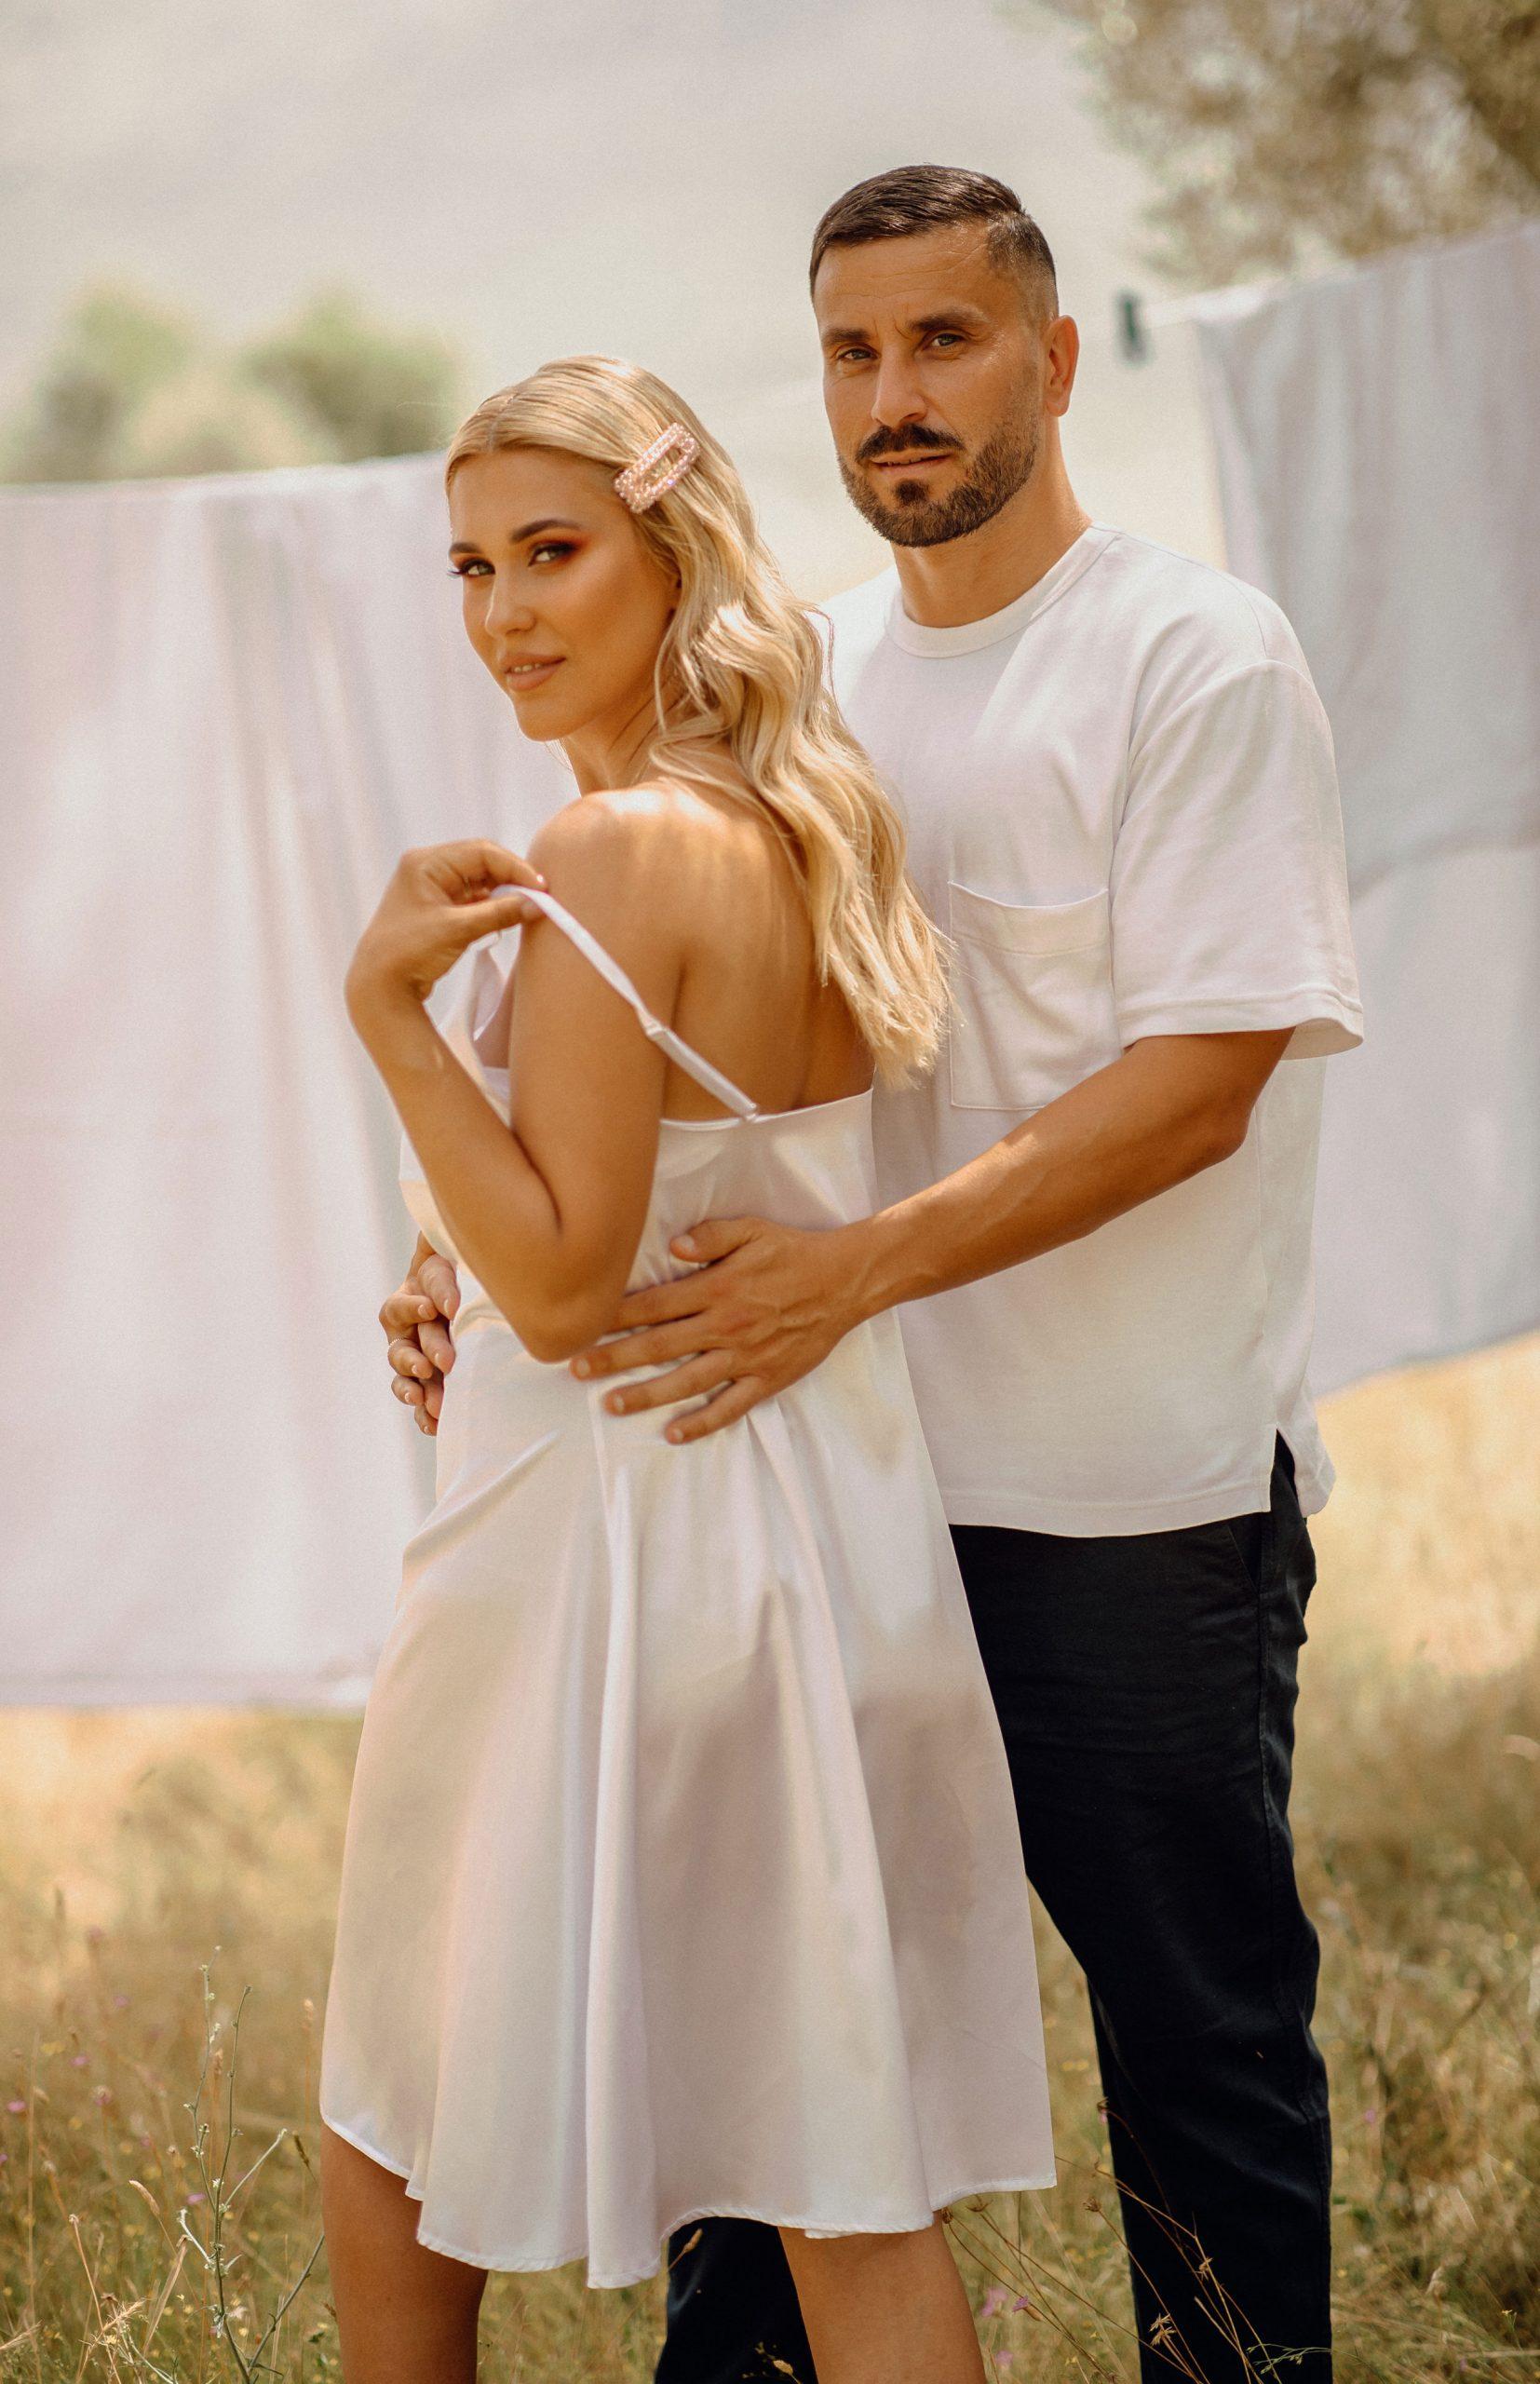 Field-Couple-Photos